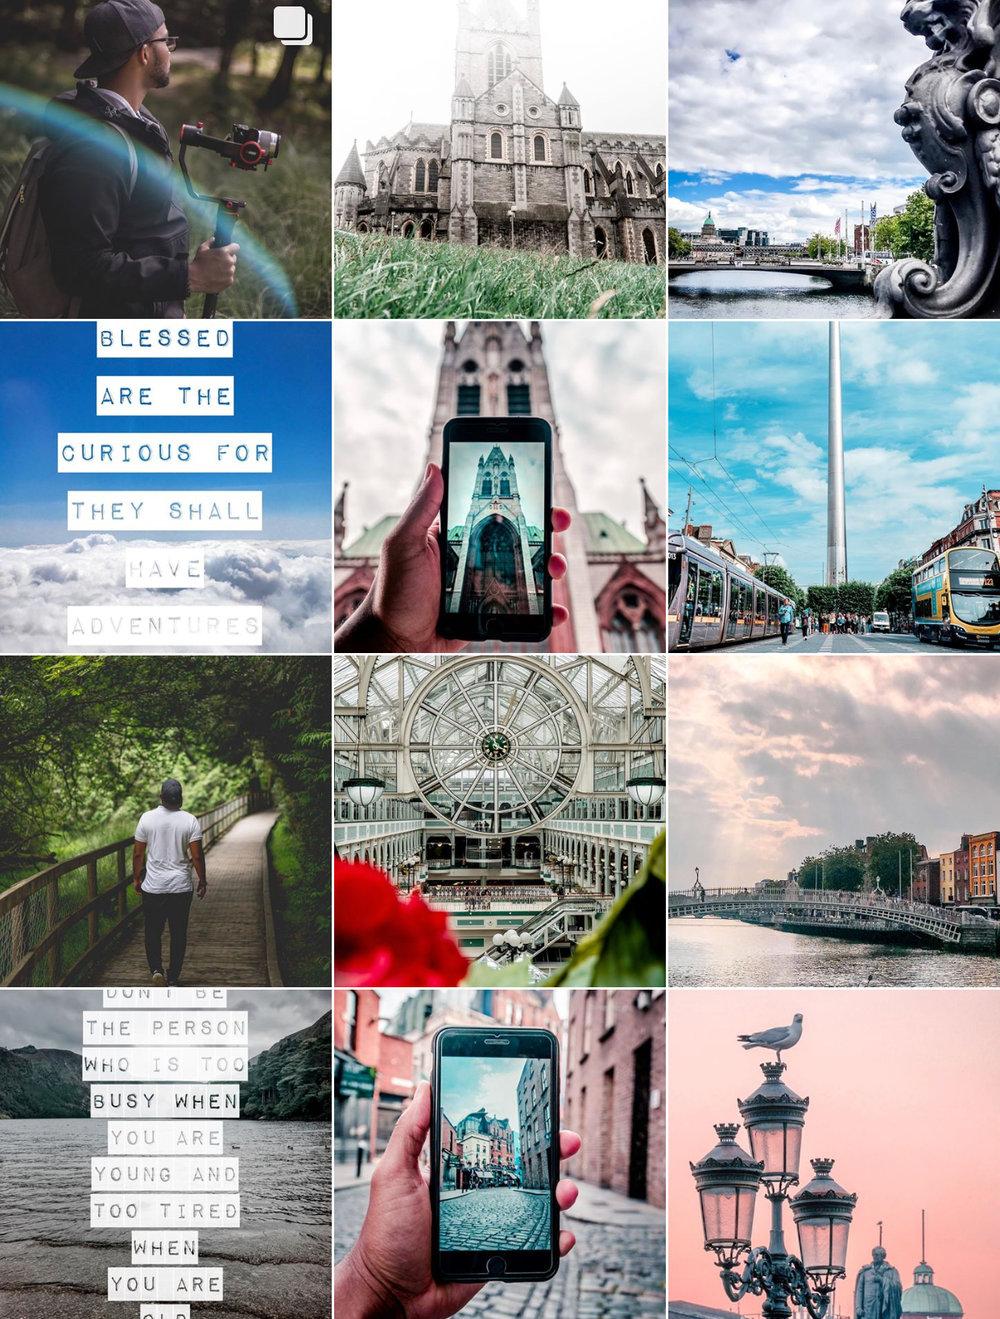 TheMillennialNomad Instagram Account